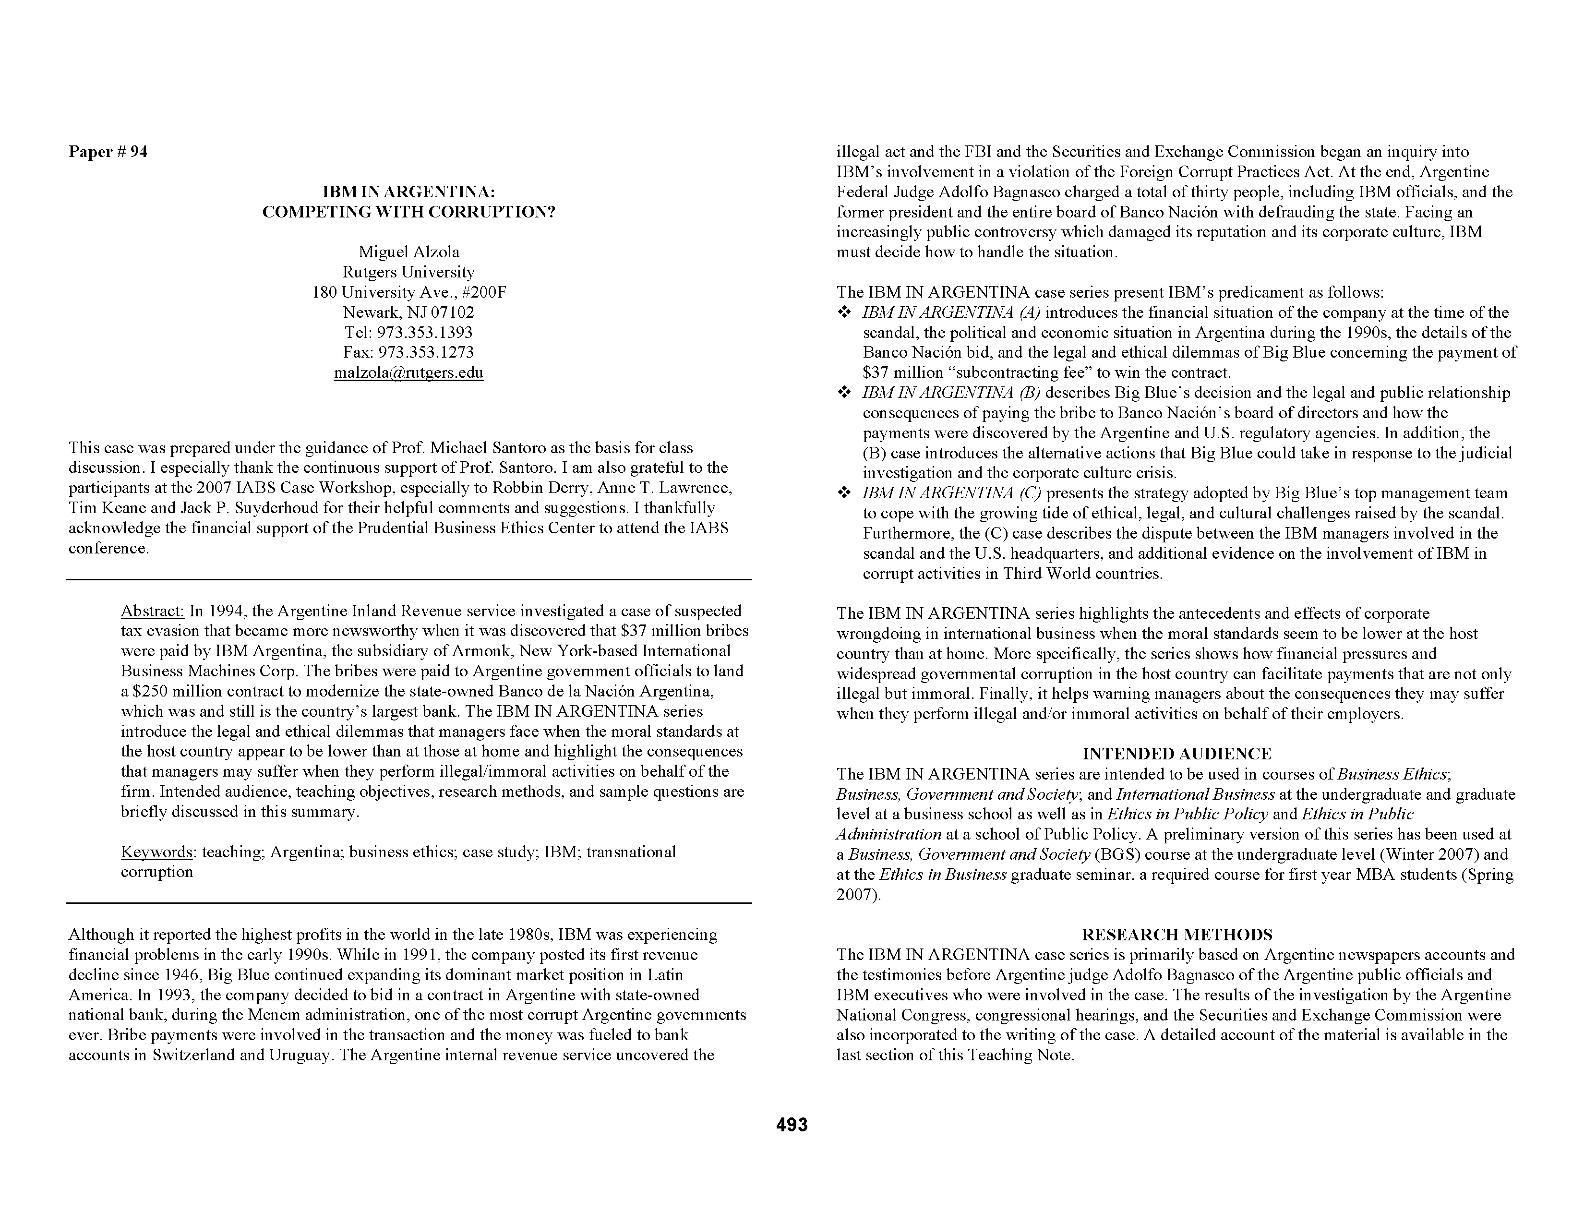 International business in focus essay